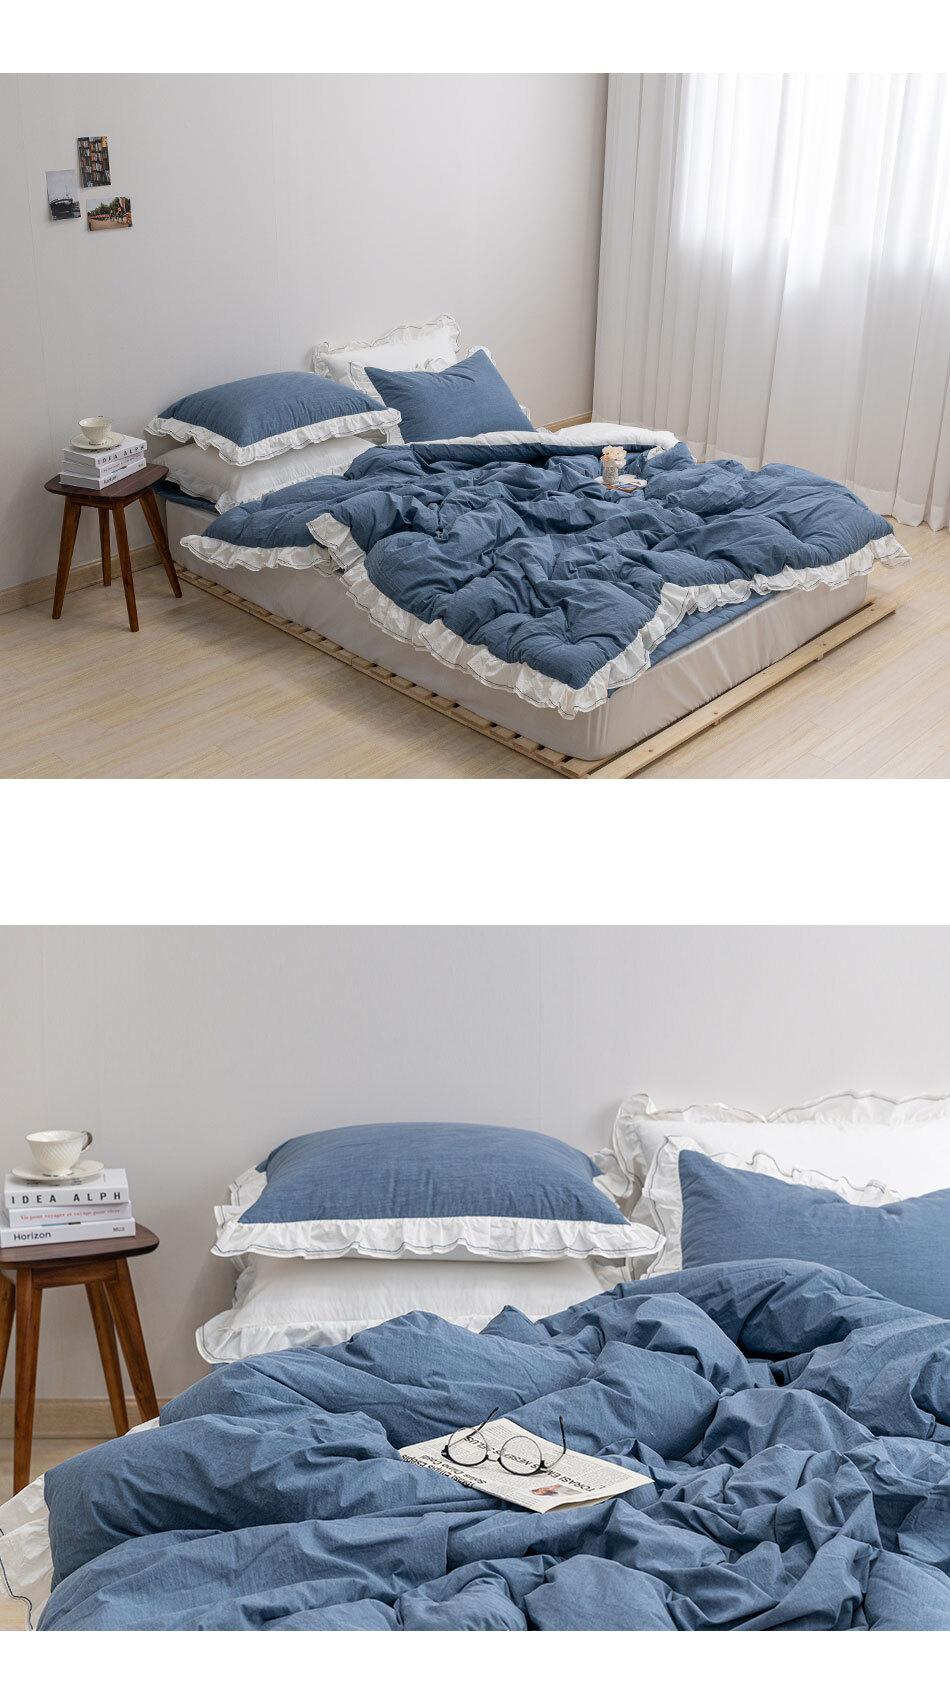 stay_bed_blue3.jpg